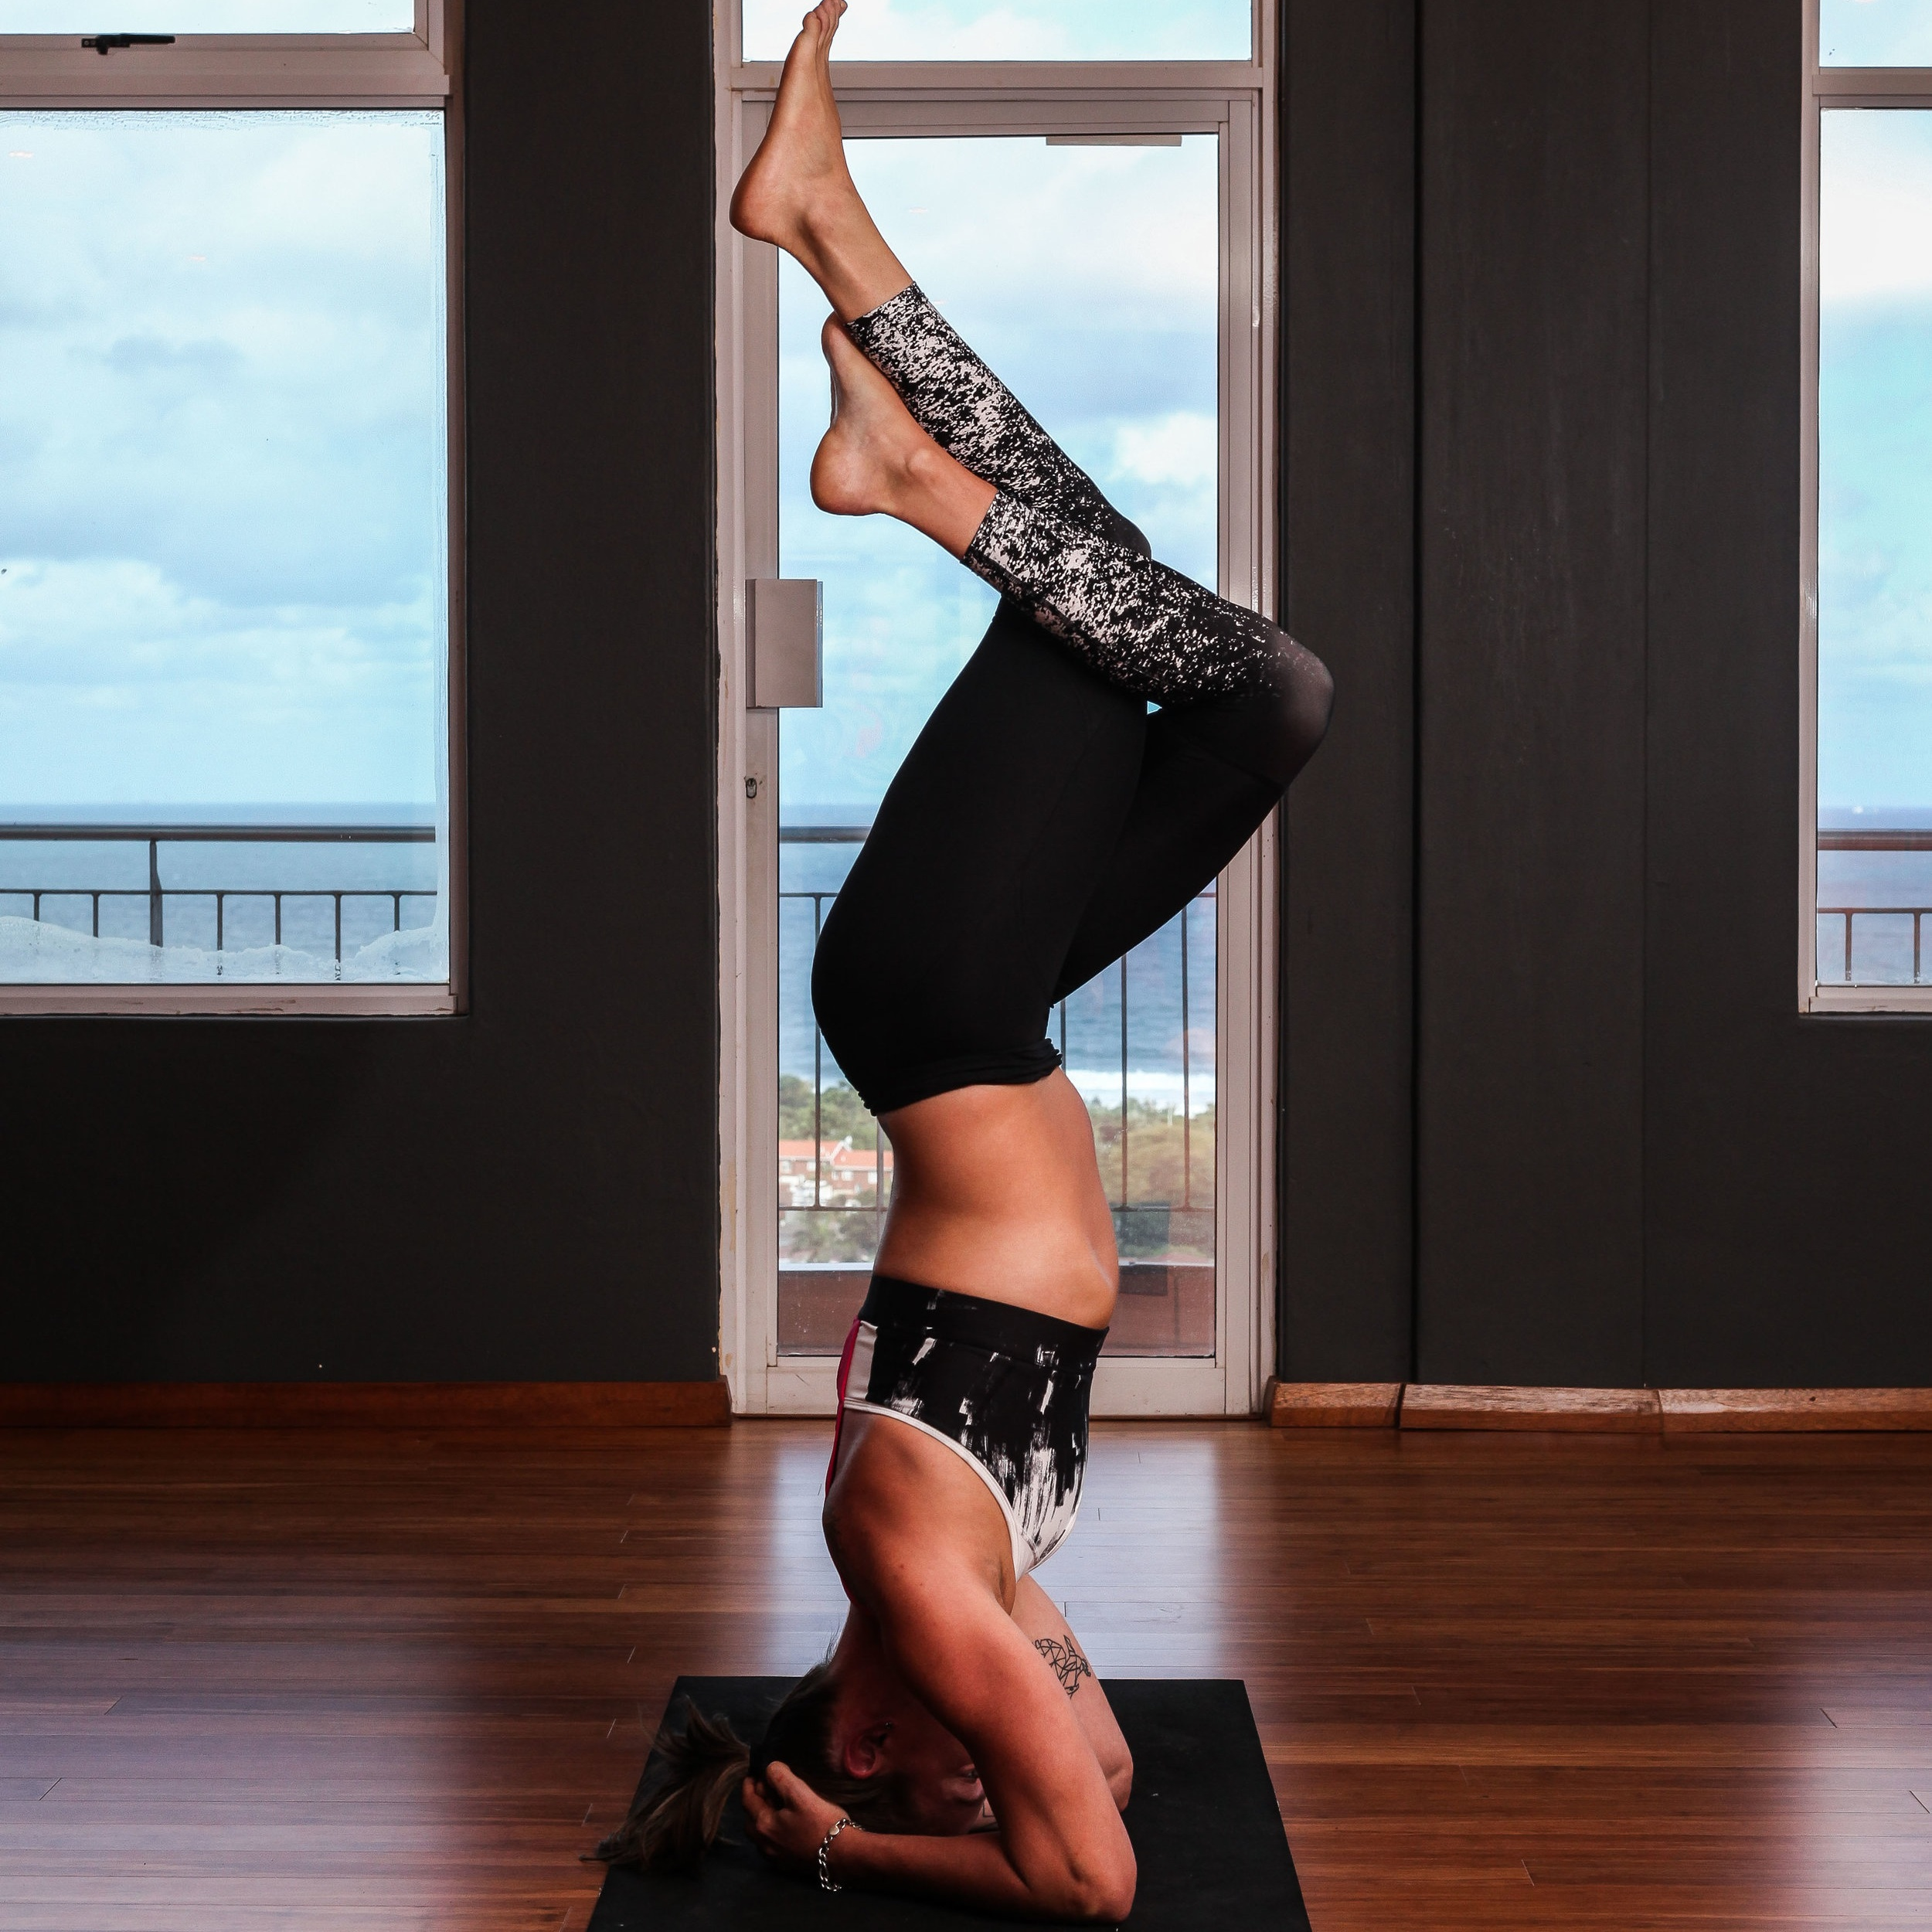 Durban North - Forrest Yoga, Power Yoga, Vinyasa, Sculpt YogaWebsite | Email | Facebook | InstagramStudios: Yoga Rocks083 728 4727